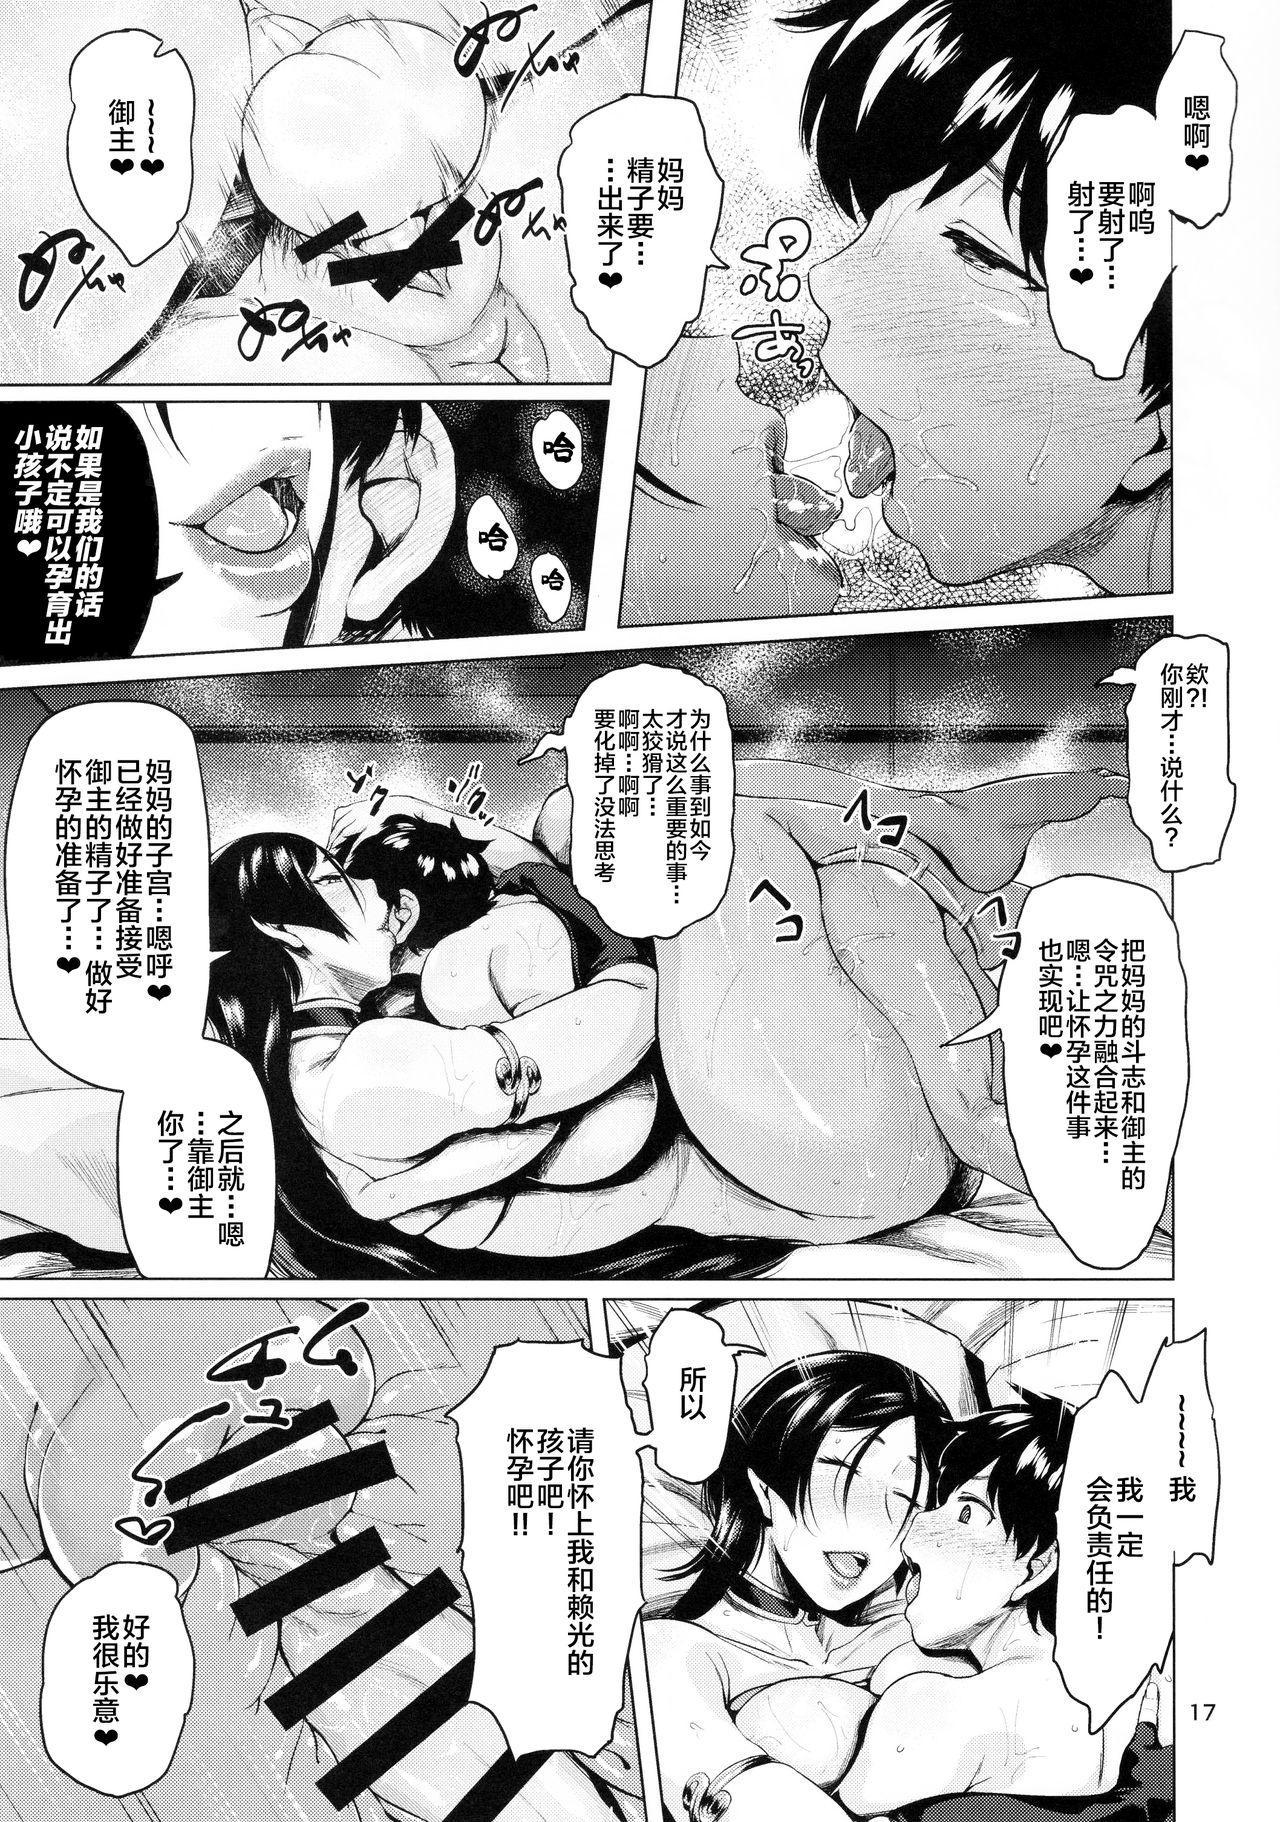 Natsu no Haha ni Goyoujin 18